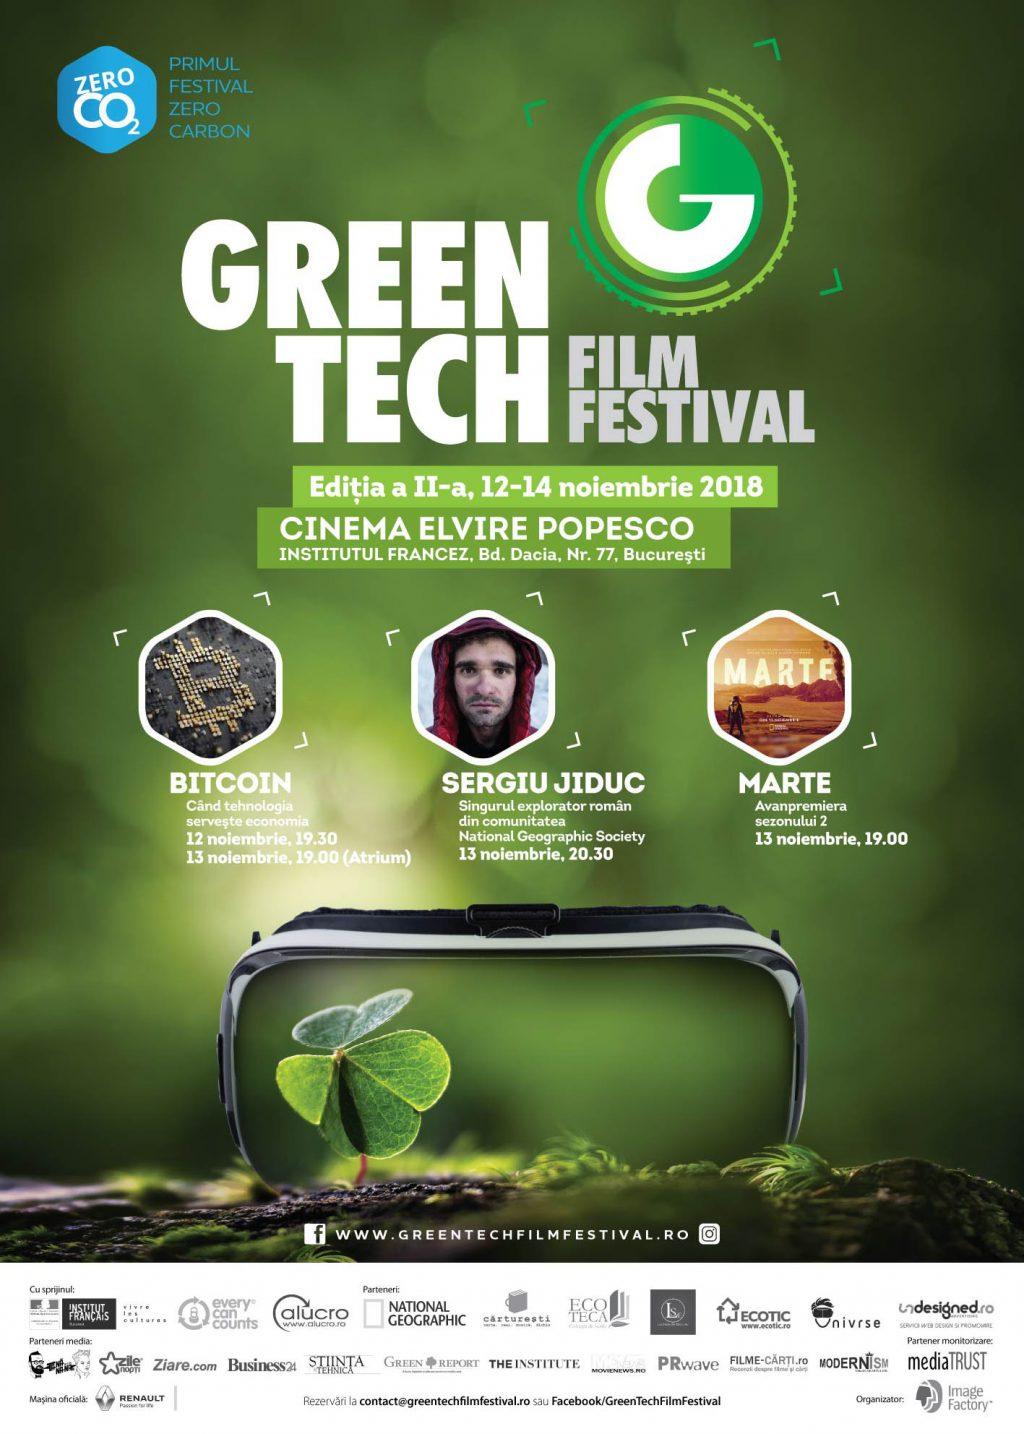 Singurul explorator român din National Geographic Society,Sergiu Jiduc, vine la GreenTech Film Festival